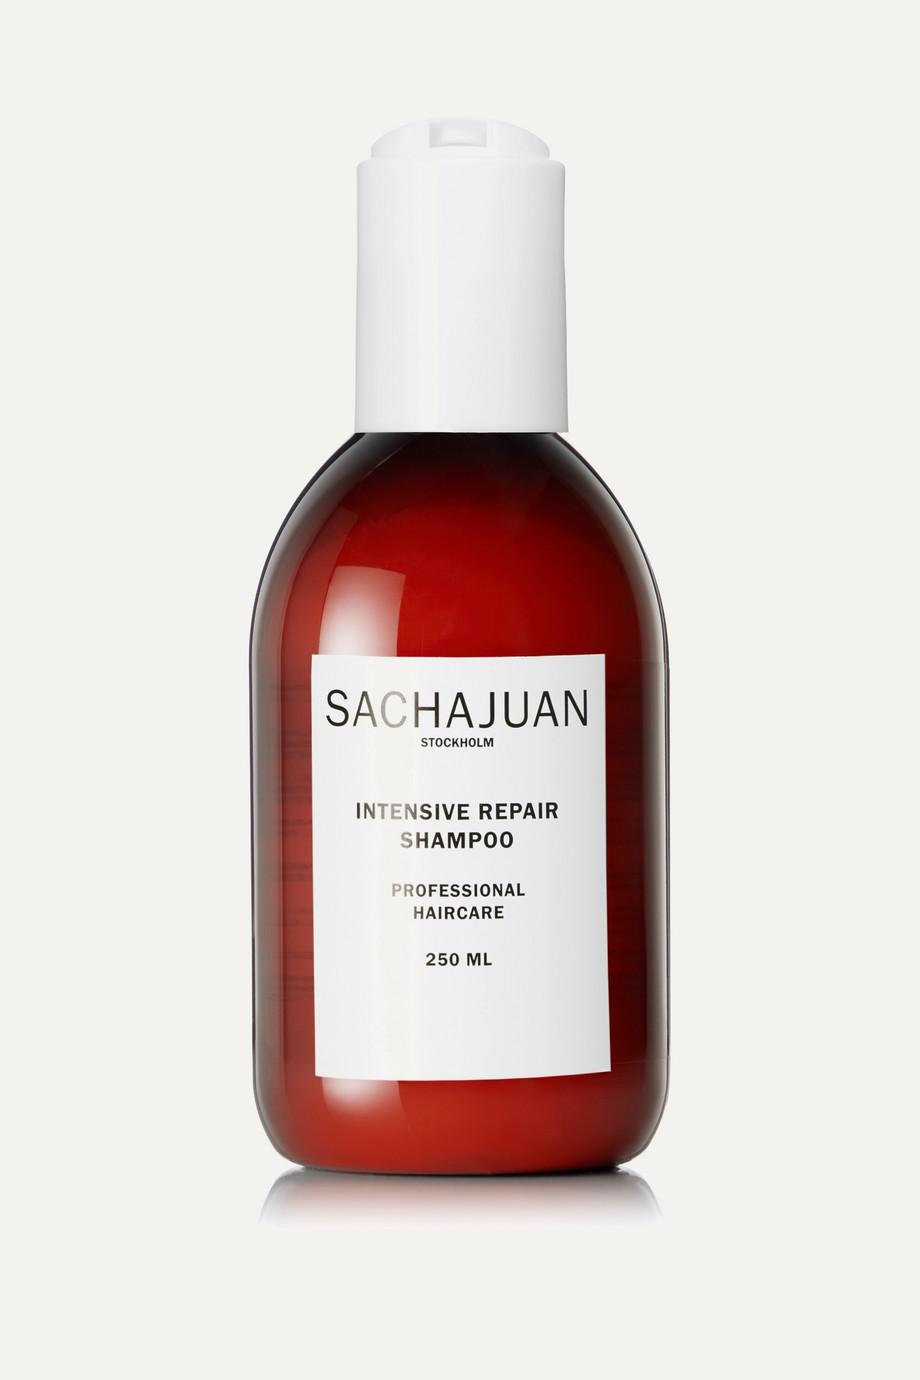 SACHAJUAN Intensive Repair Shampoo, 250 ml – Shampoo